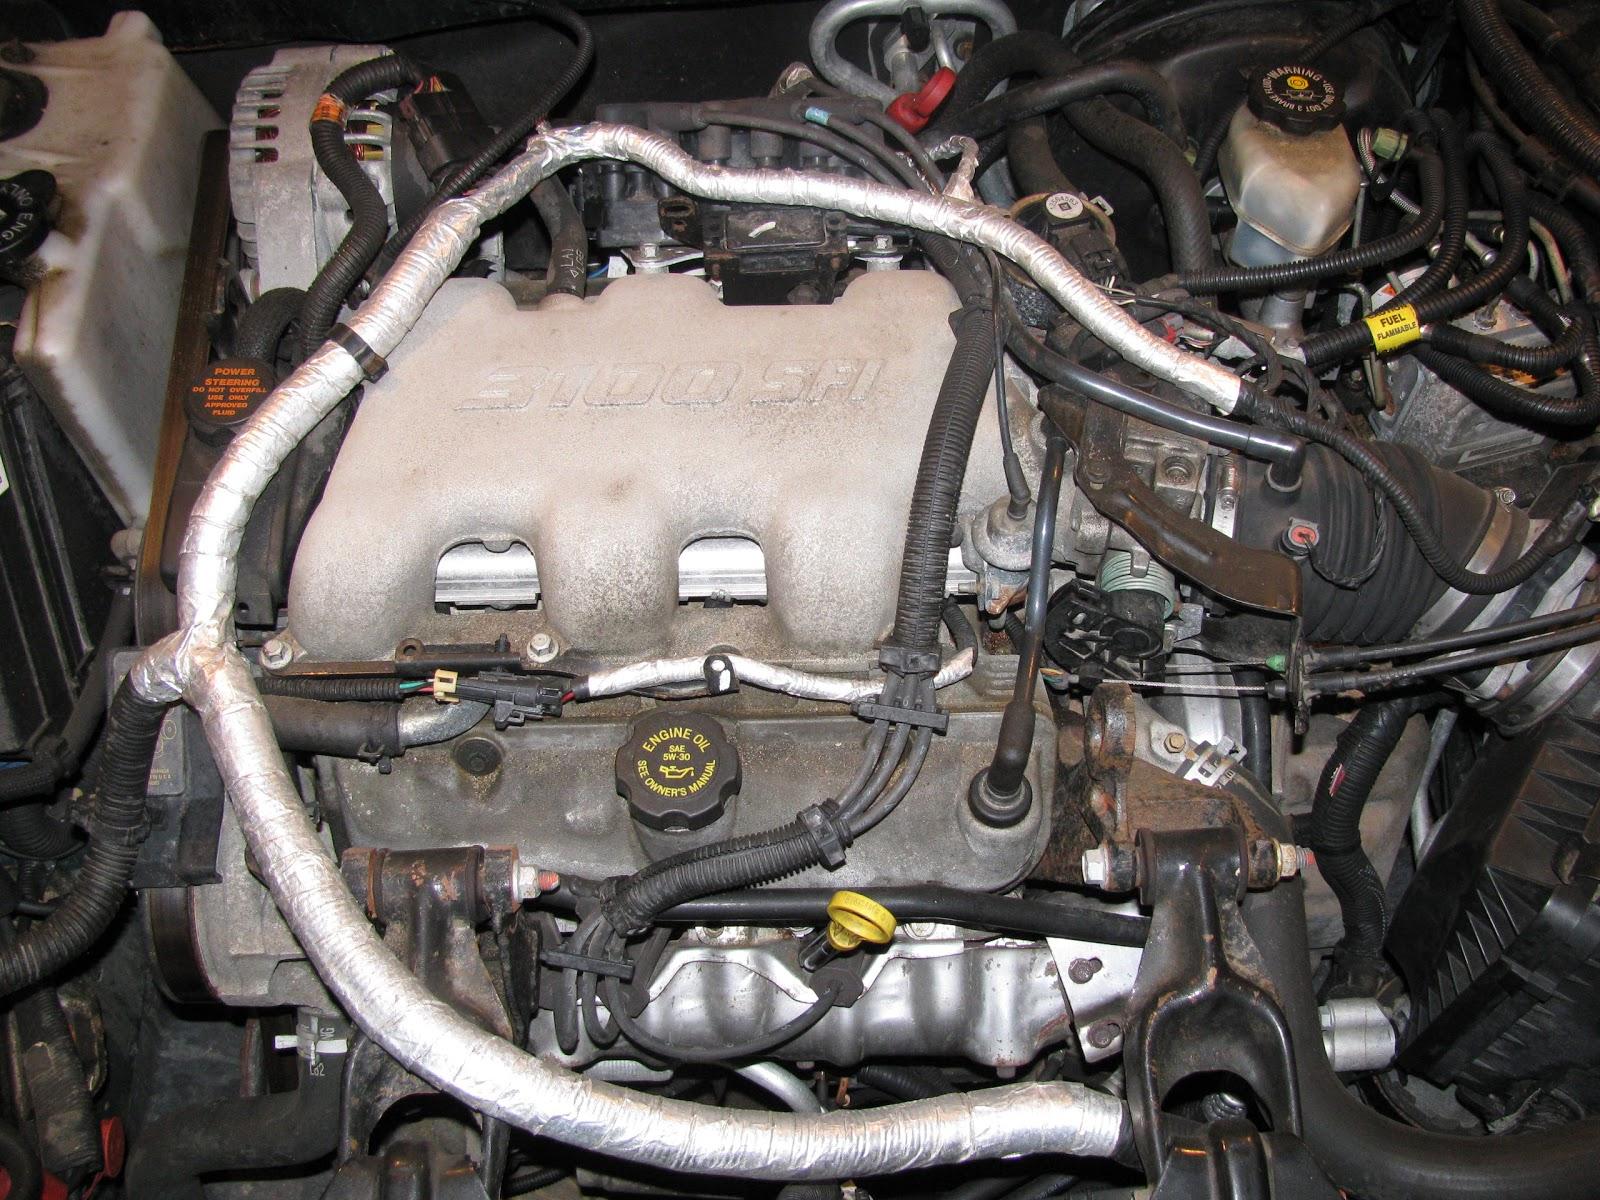 Gm Engine Diagram | Wiring Diagram - O2 Sensor Wiring Diagram Chevy